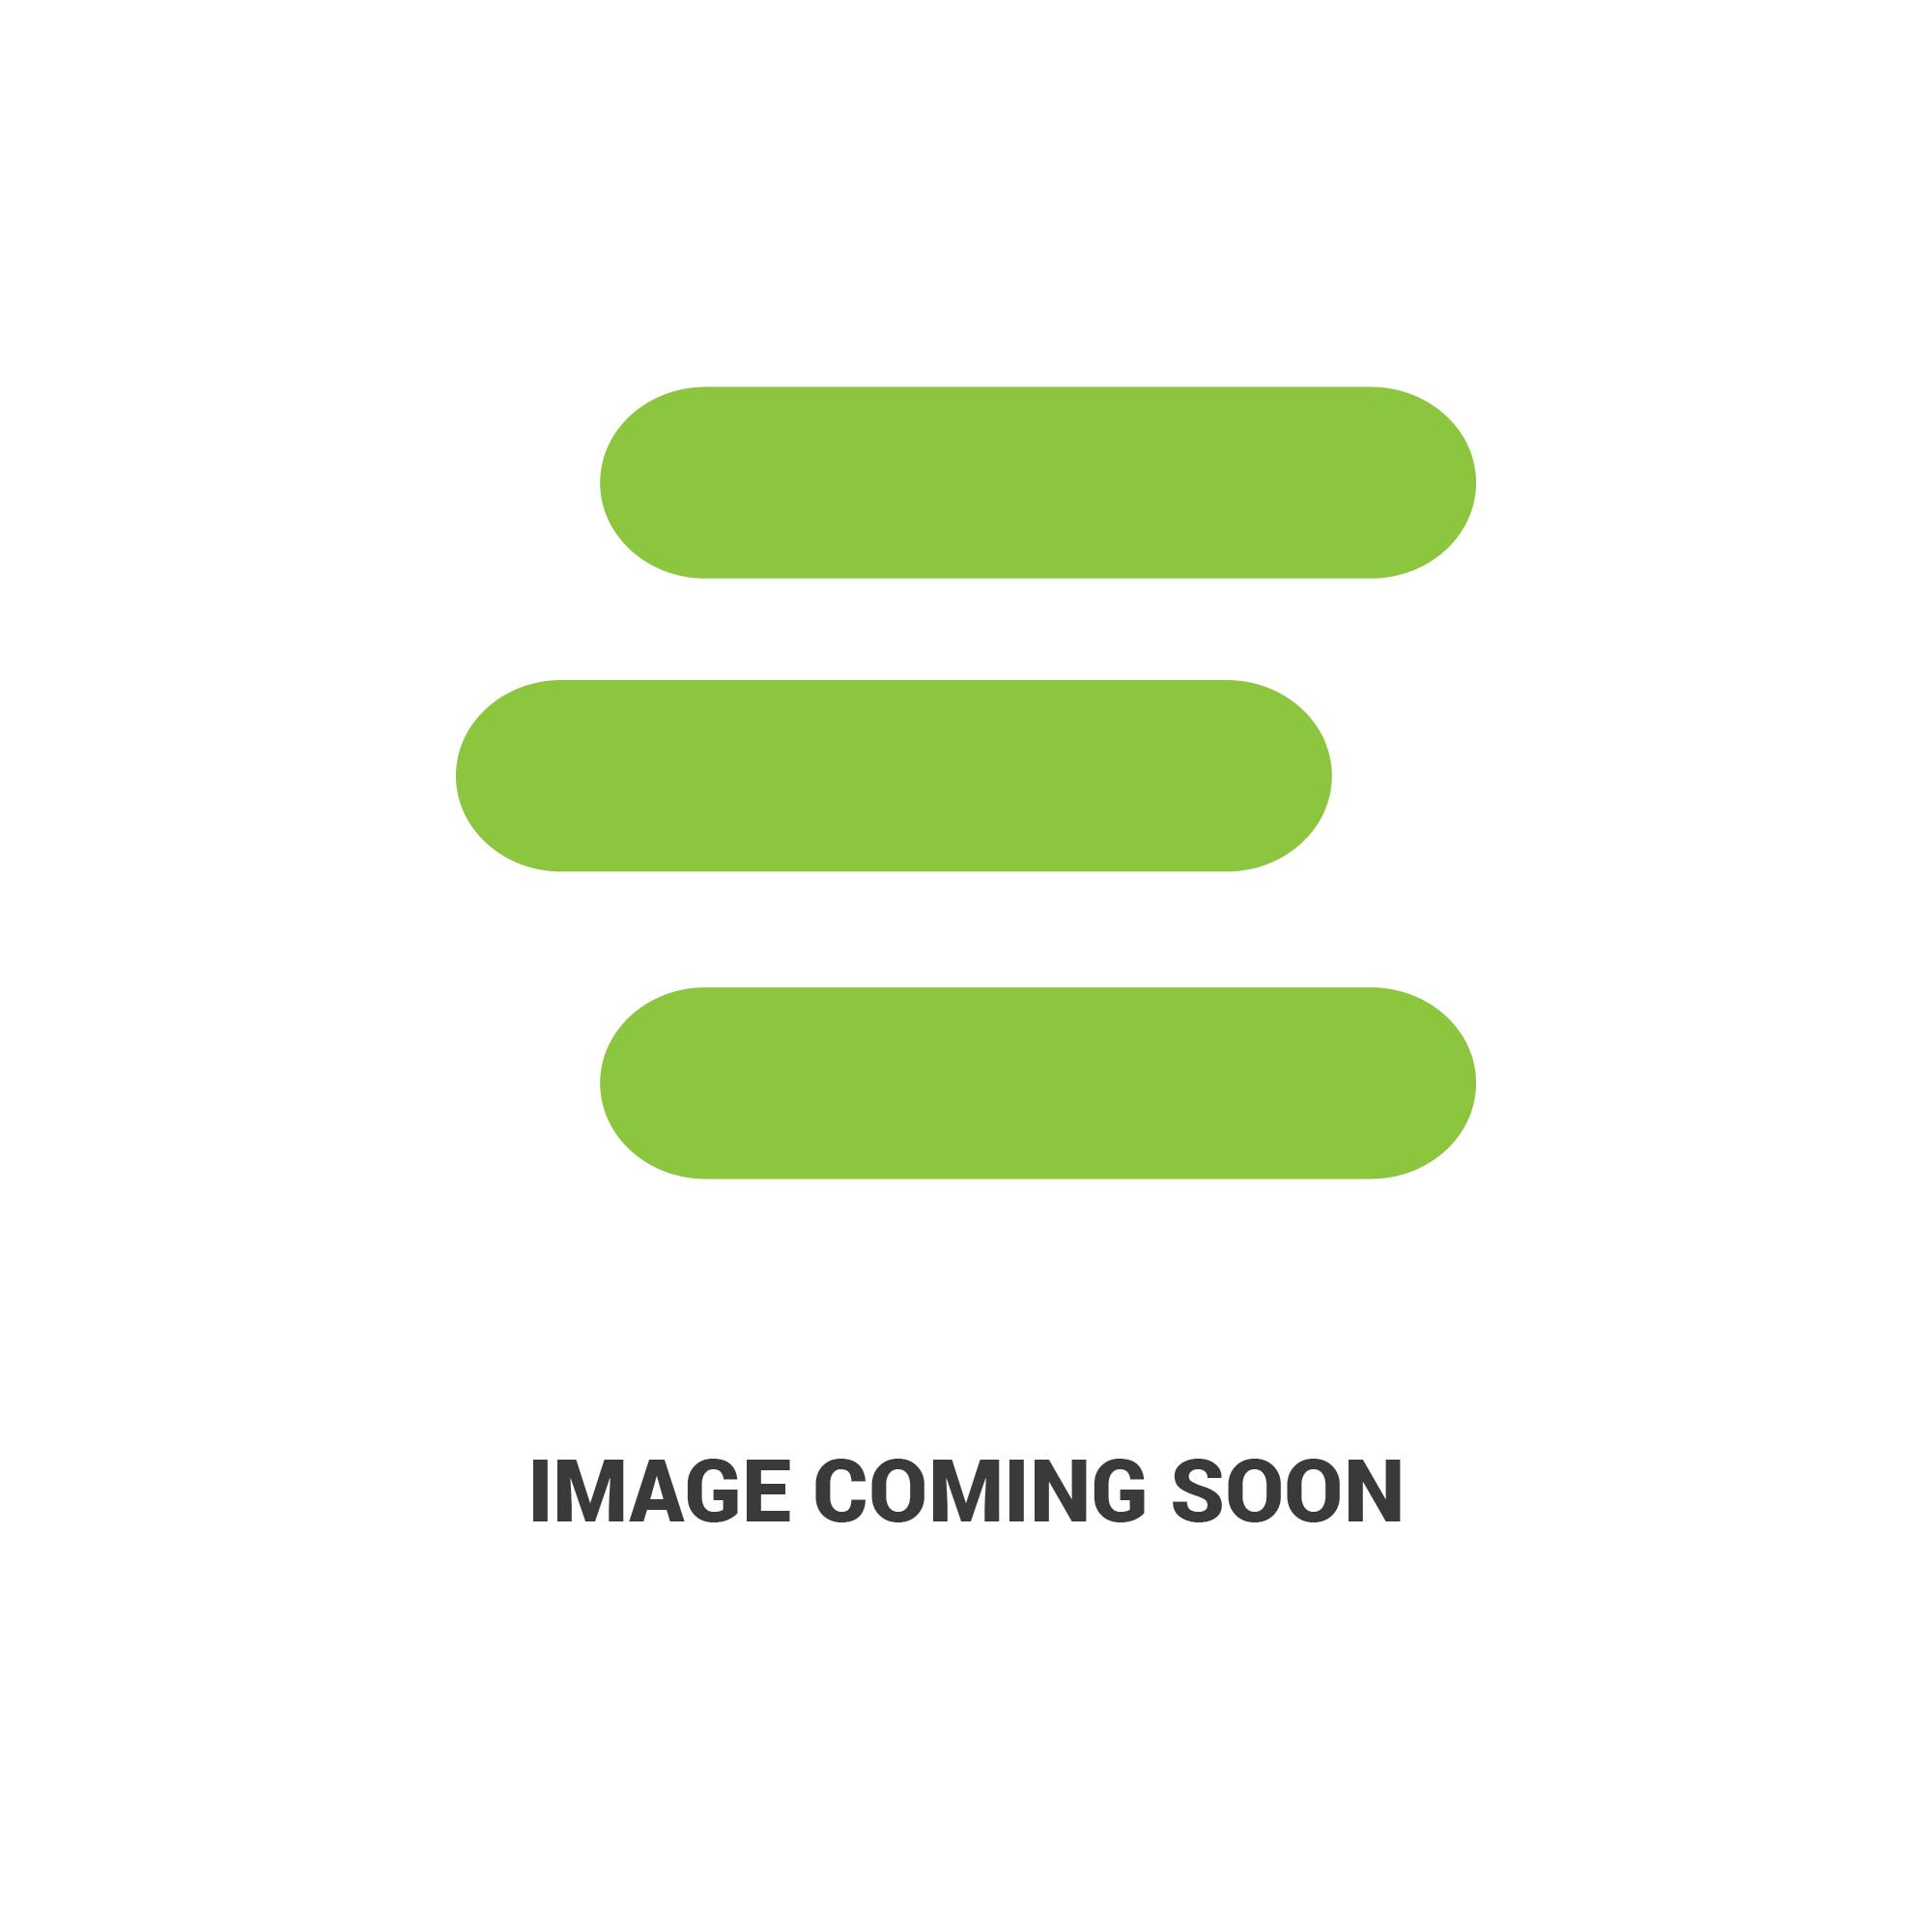 E-31381-76390edit 2.jpg